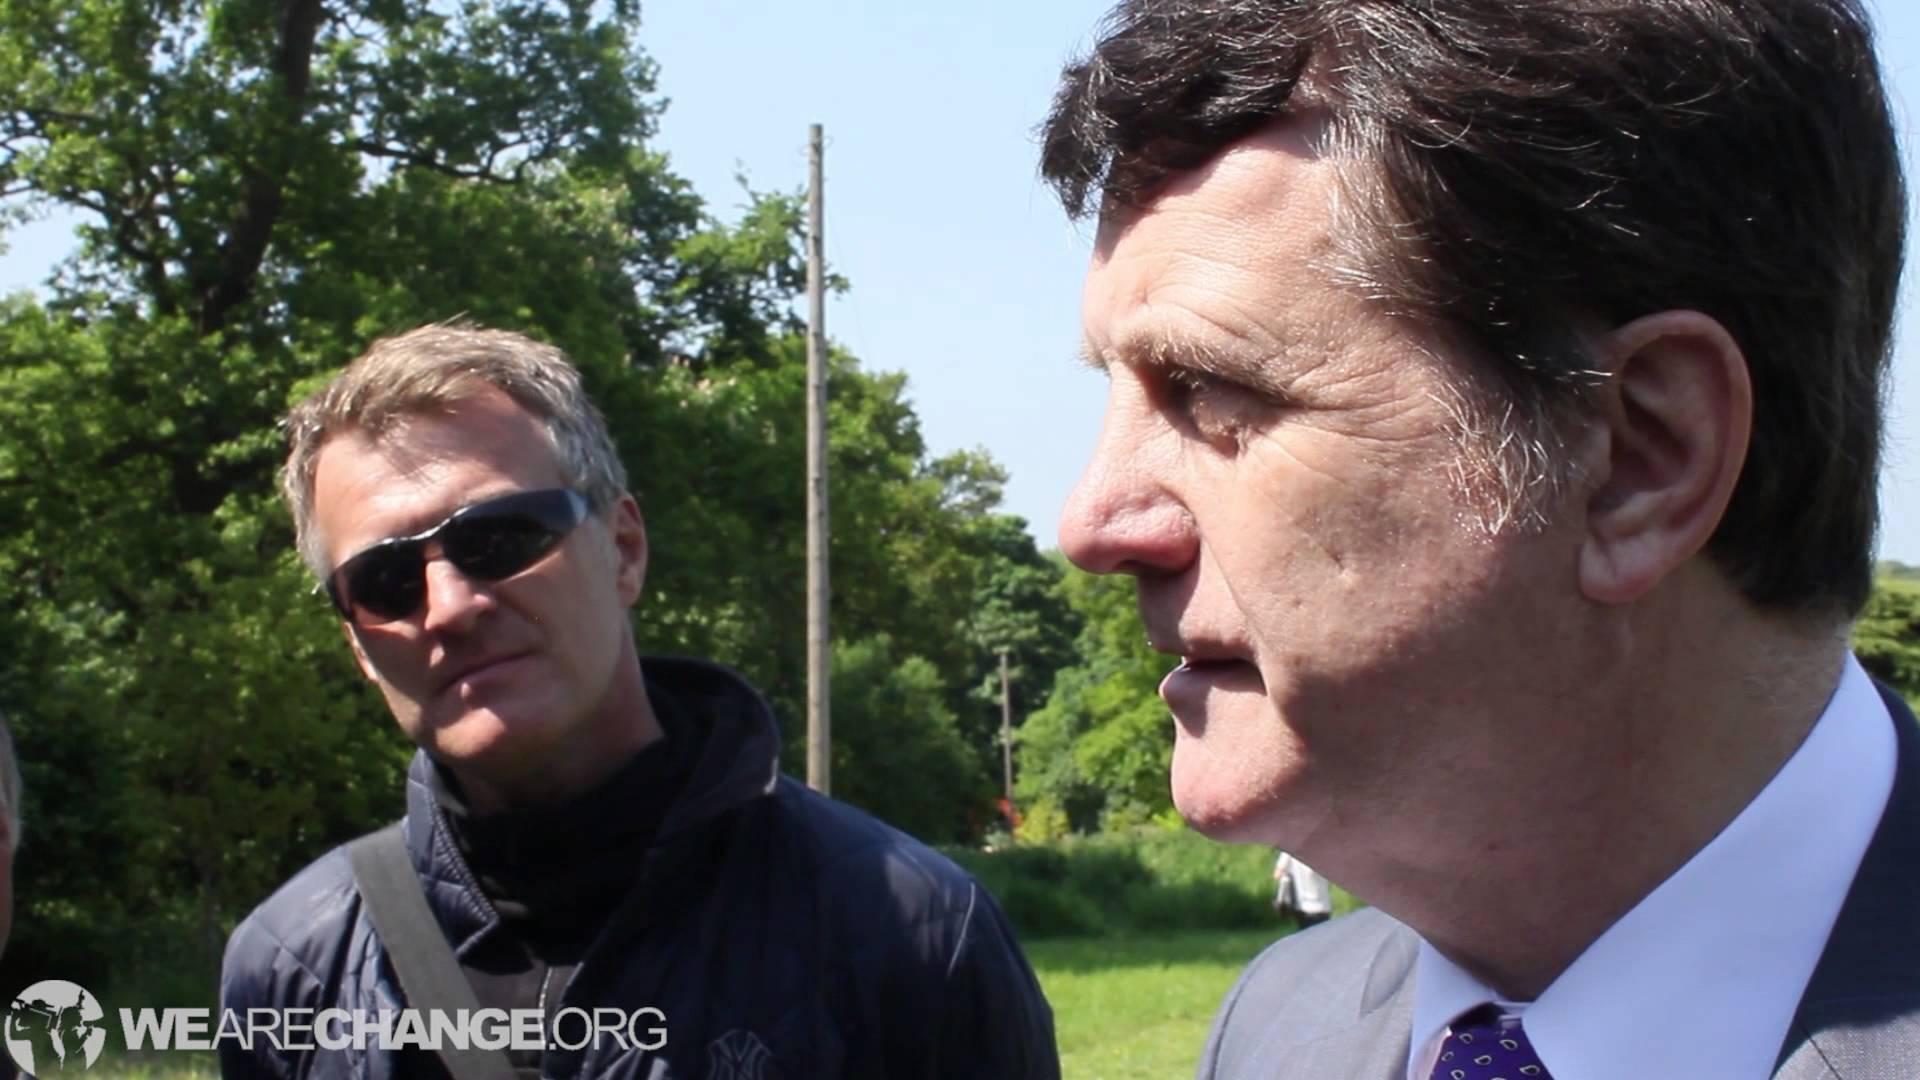 UKIP and EU Parliament Member on Bilderberg 'Conspiracy'